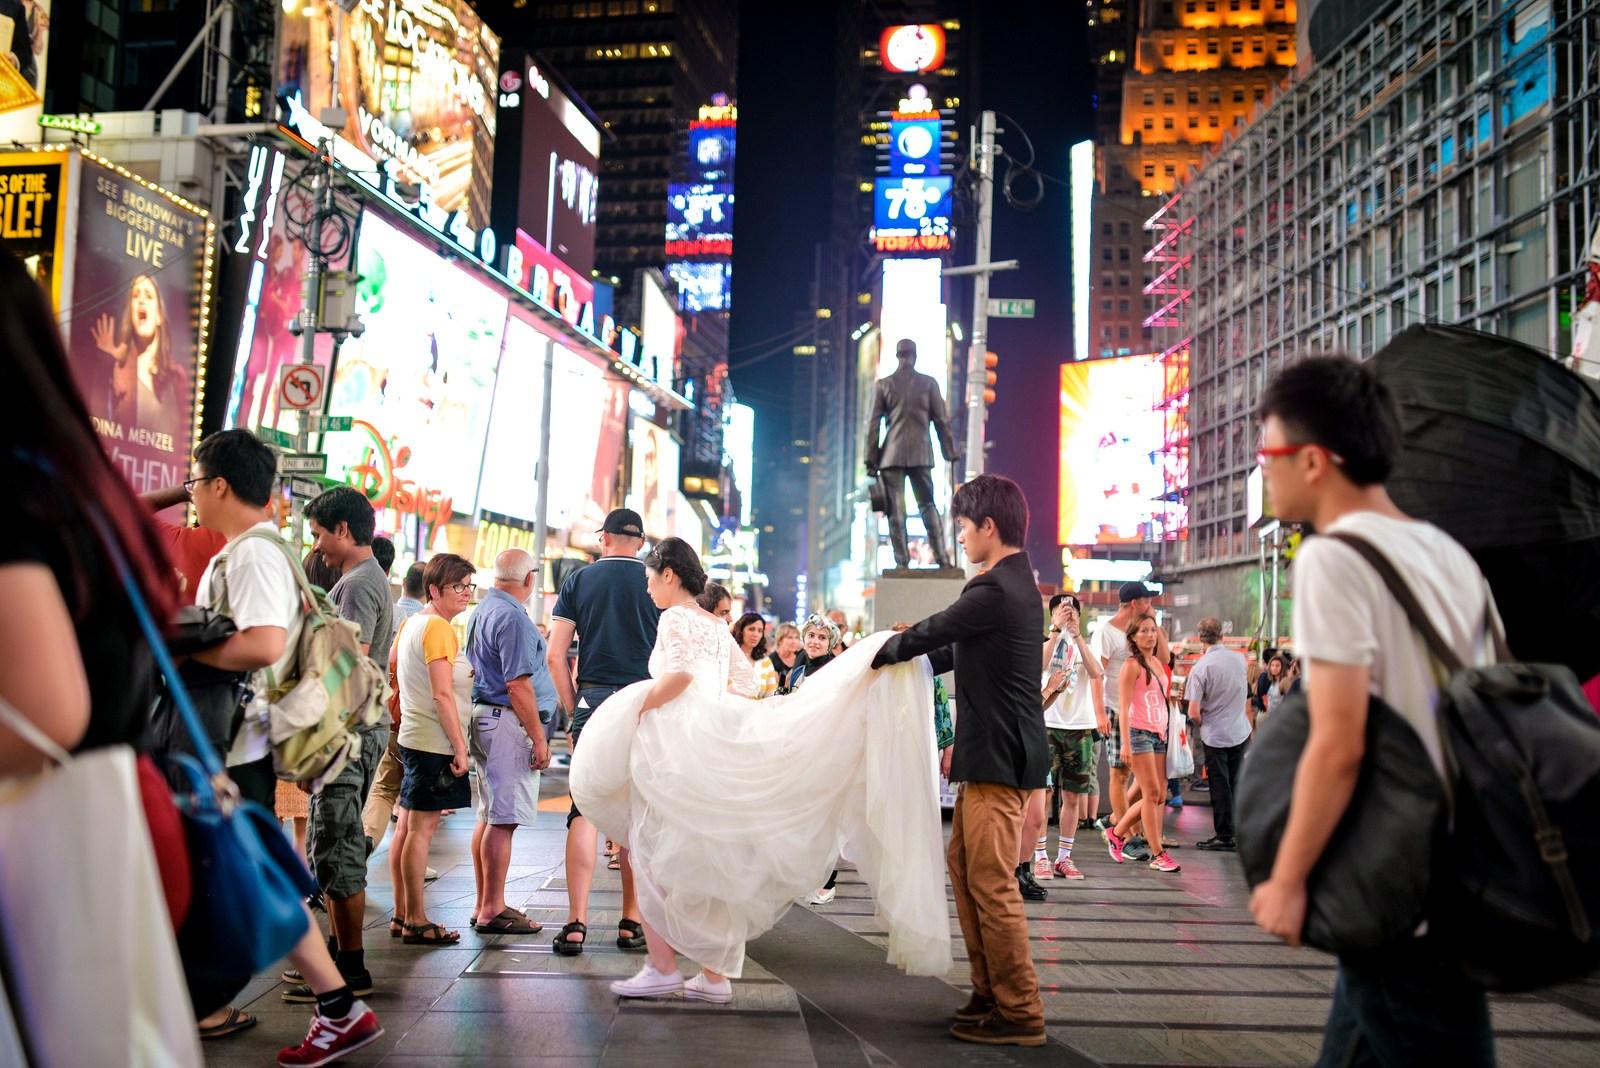 Mariage à Times Square Manhattan